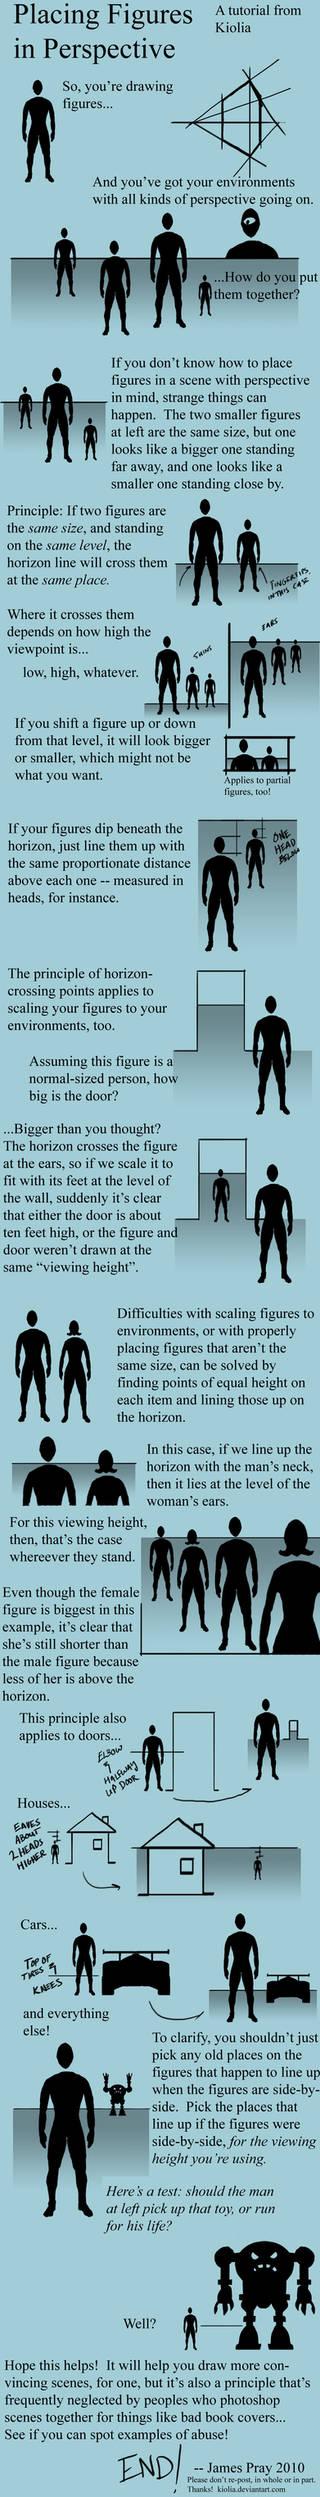 Placing Figures in Perspective